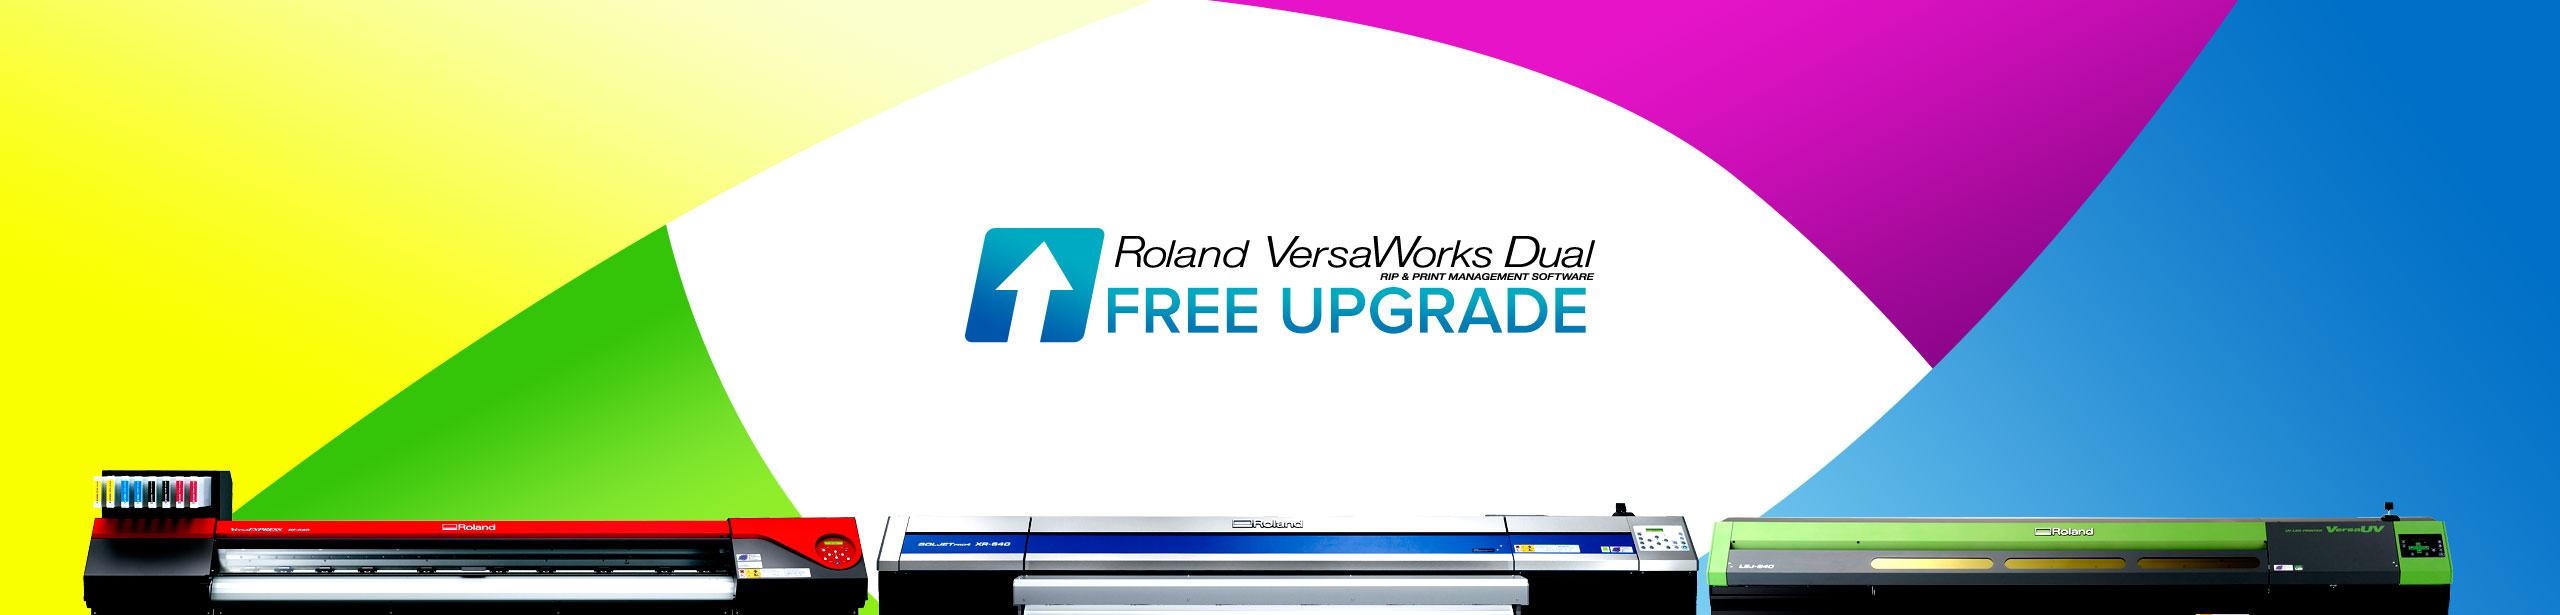 VersaWorks Dual Upgrade